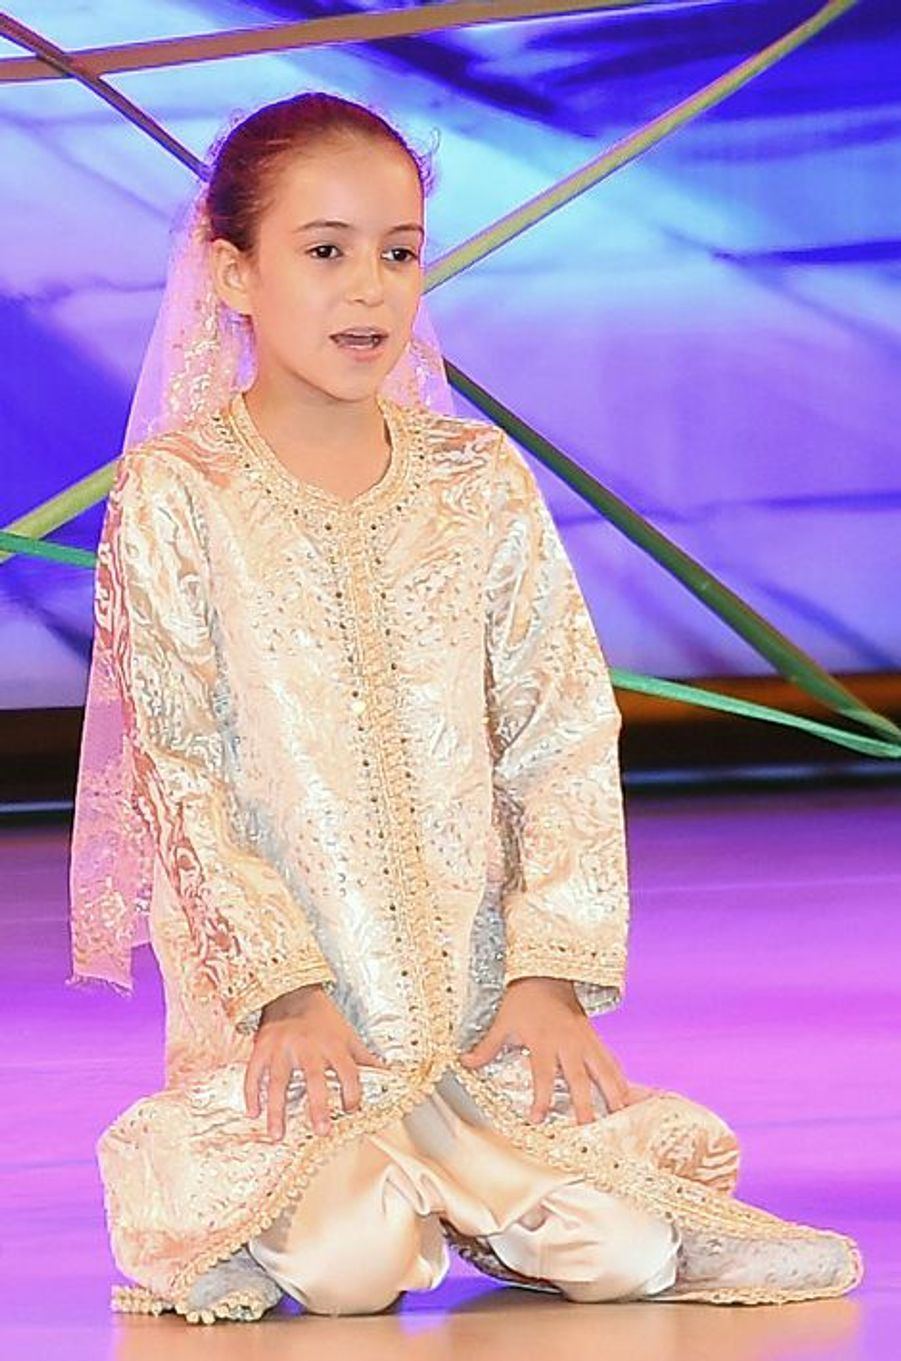 La princesse Lalla Kadija à Rabat, le 16 juin 2015